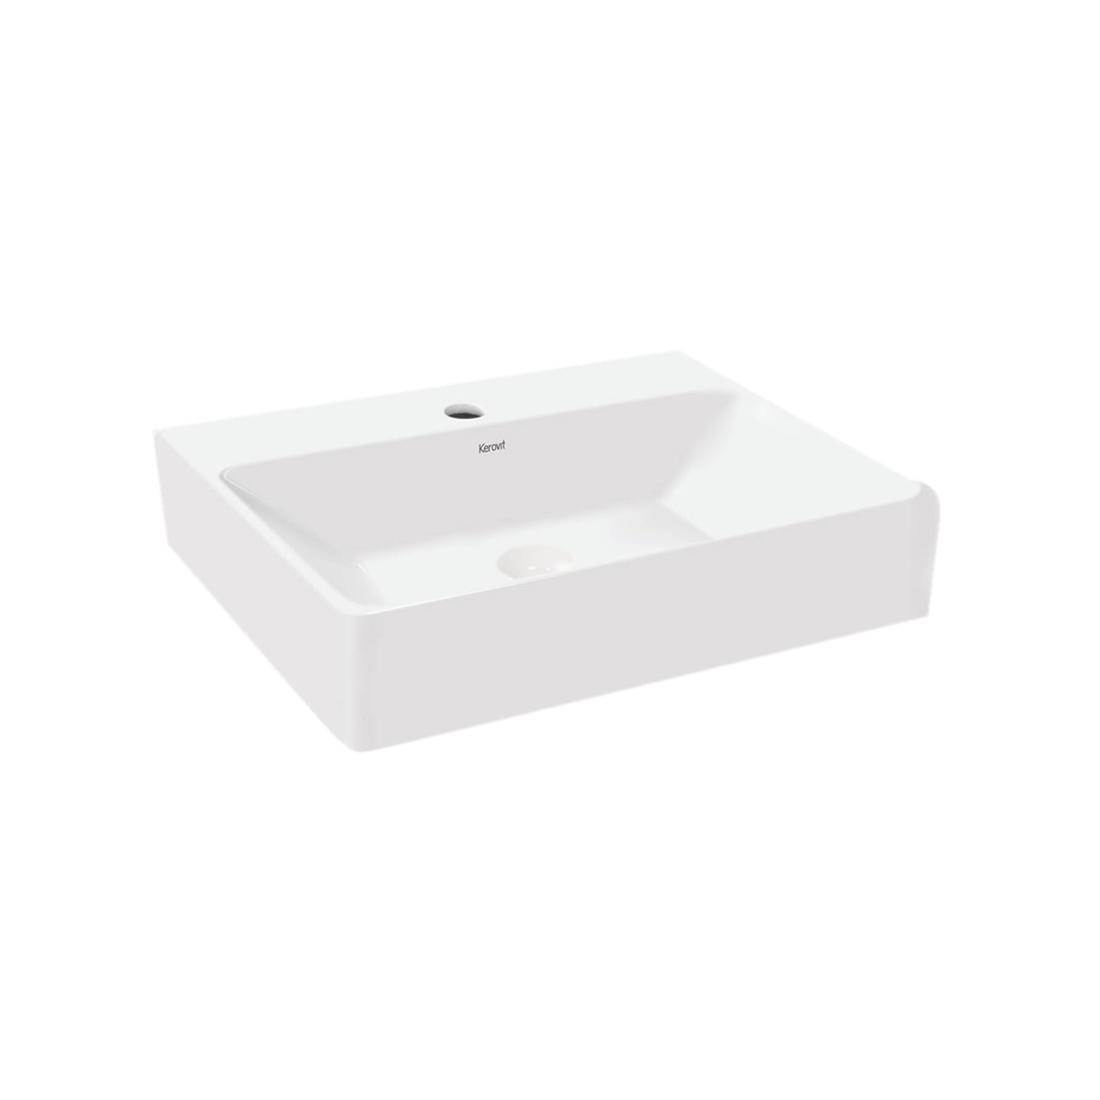 Kerovit Kacey KS204 Counter Top Wash Basin